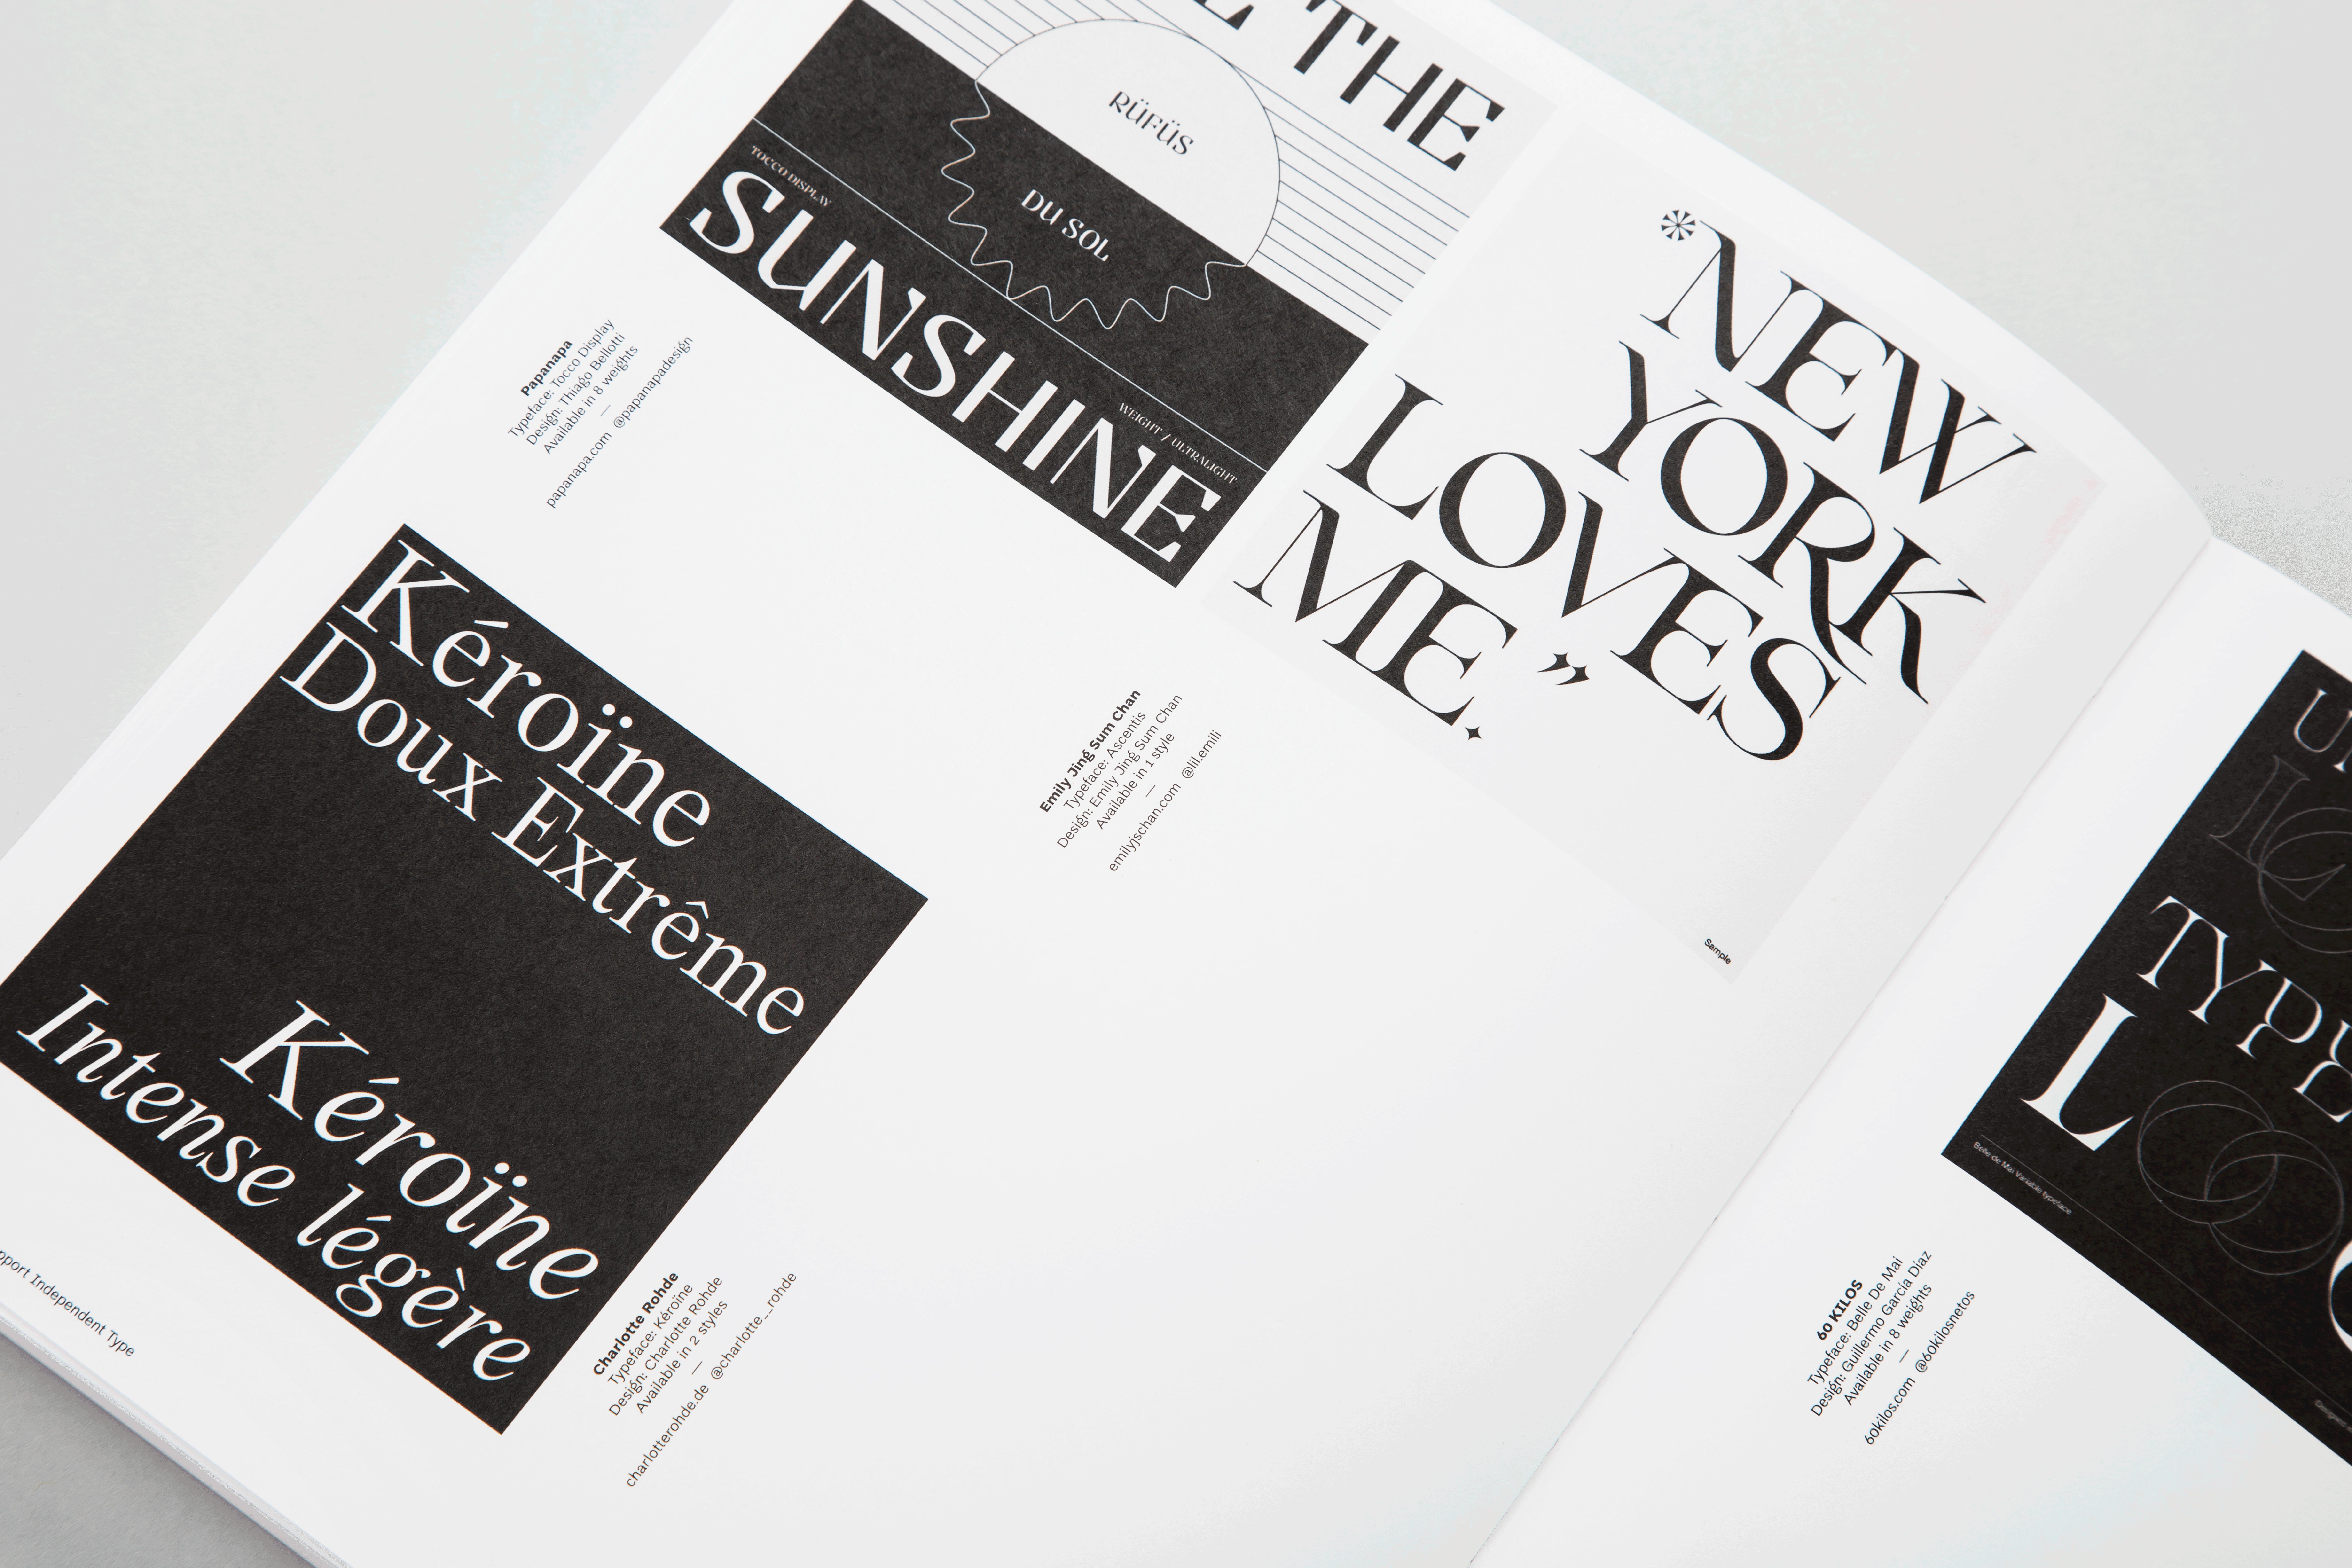 Slanted-Publiaktionen-Slanted-Publishers-Support-Independent-Type_26